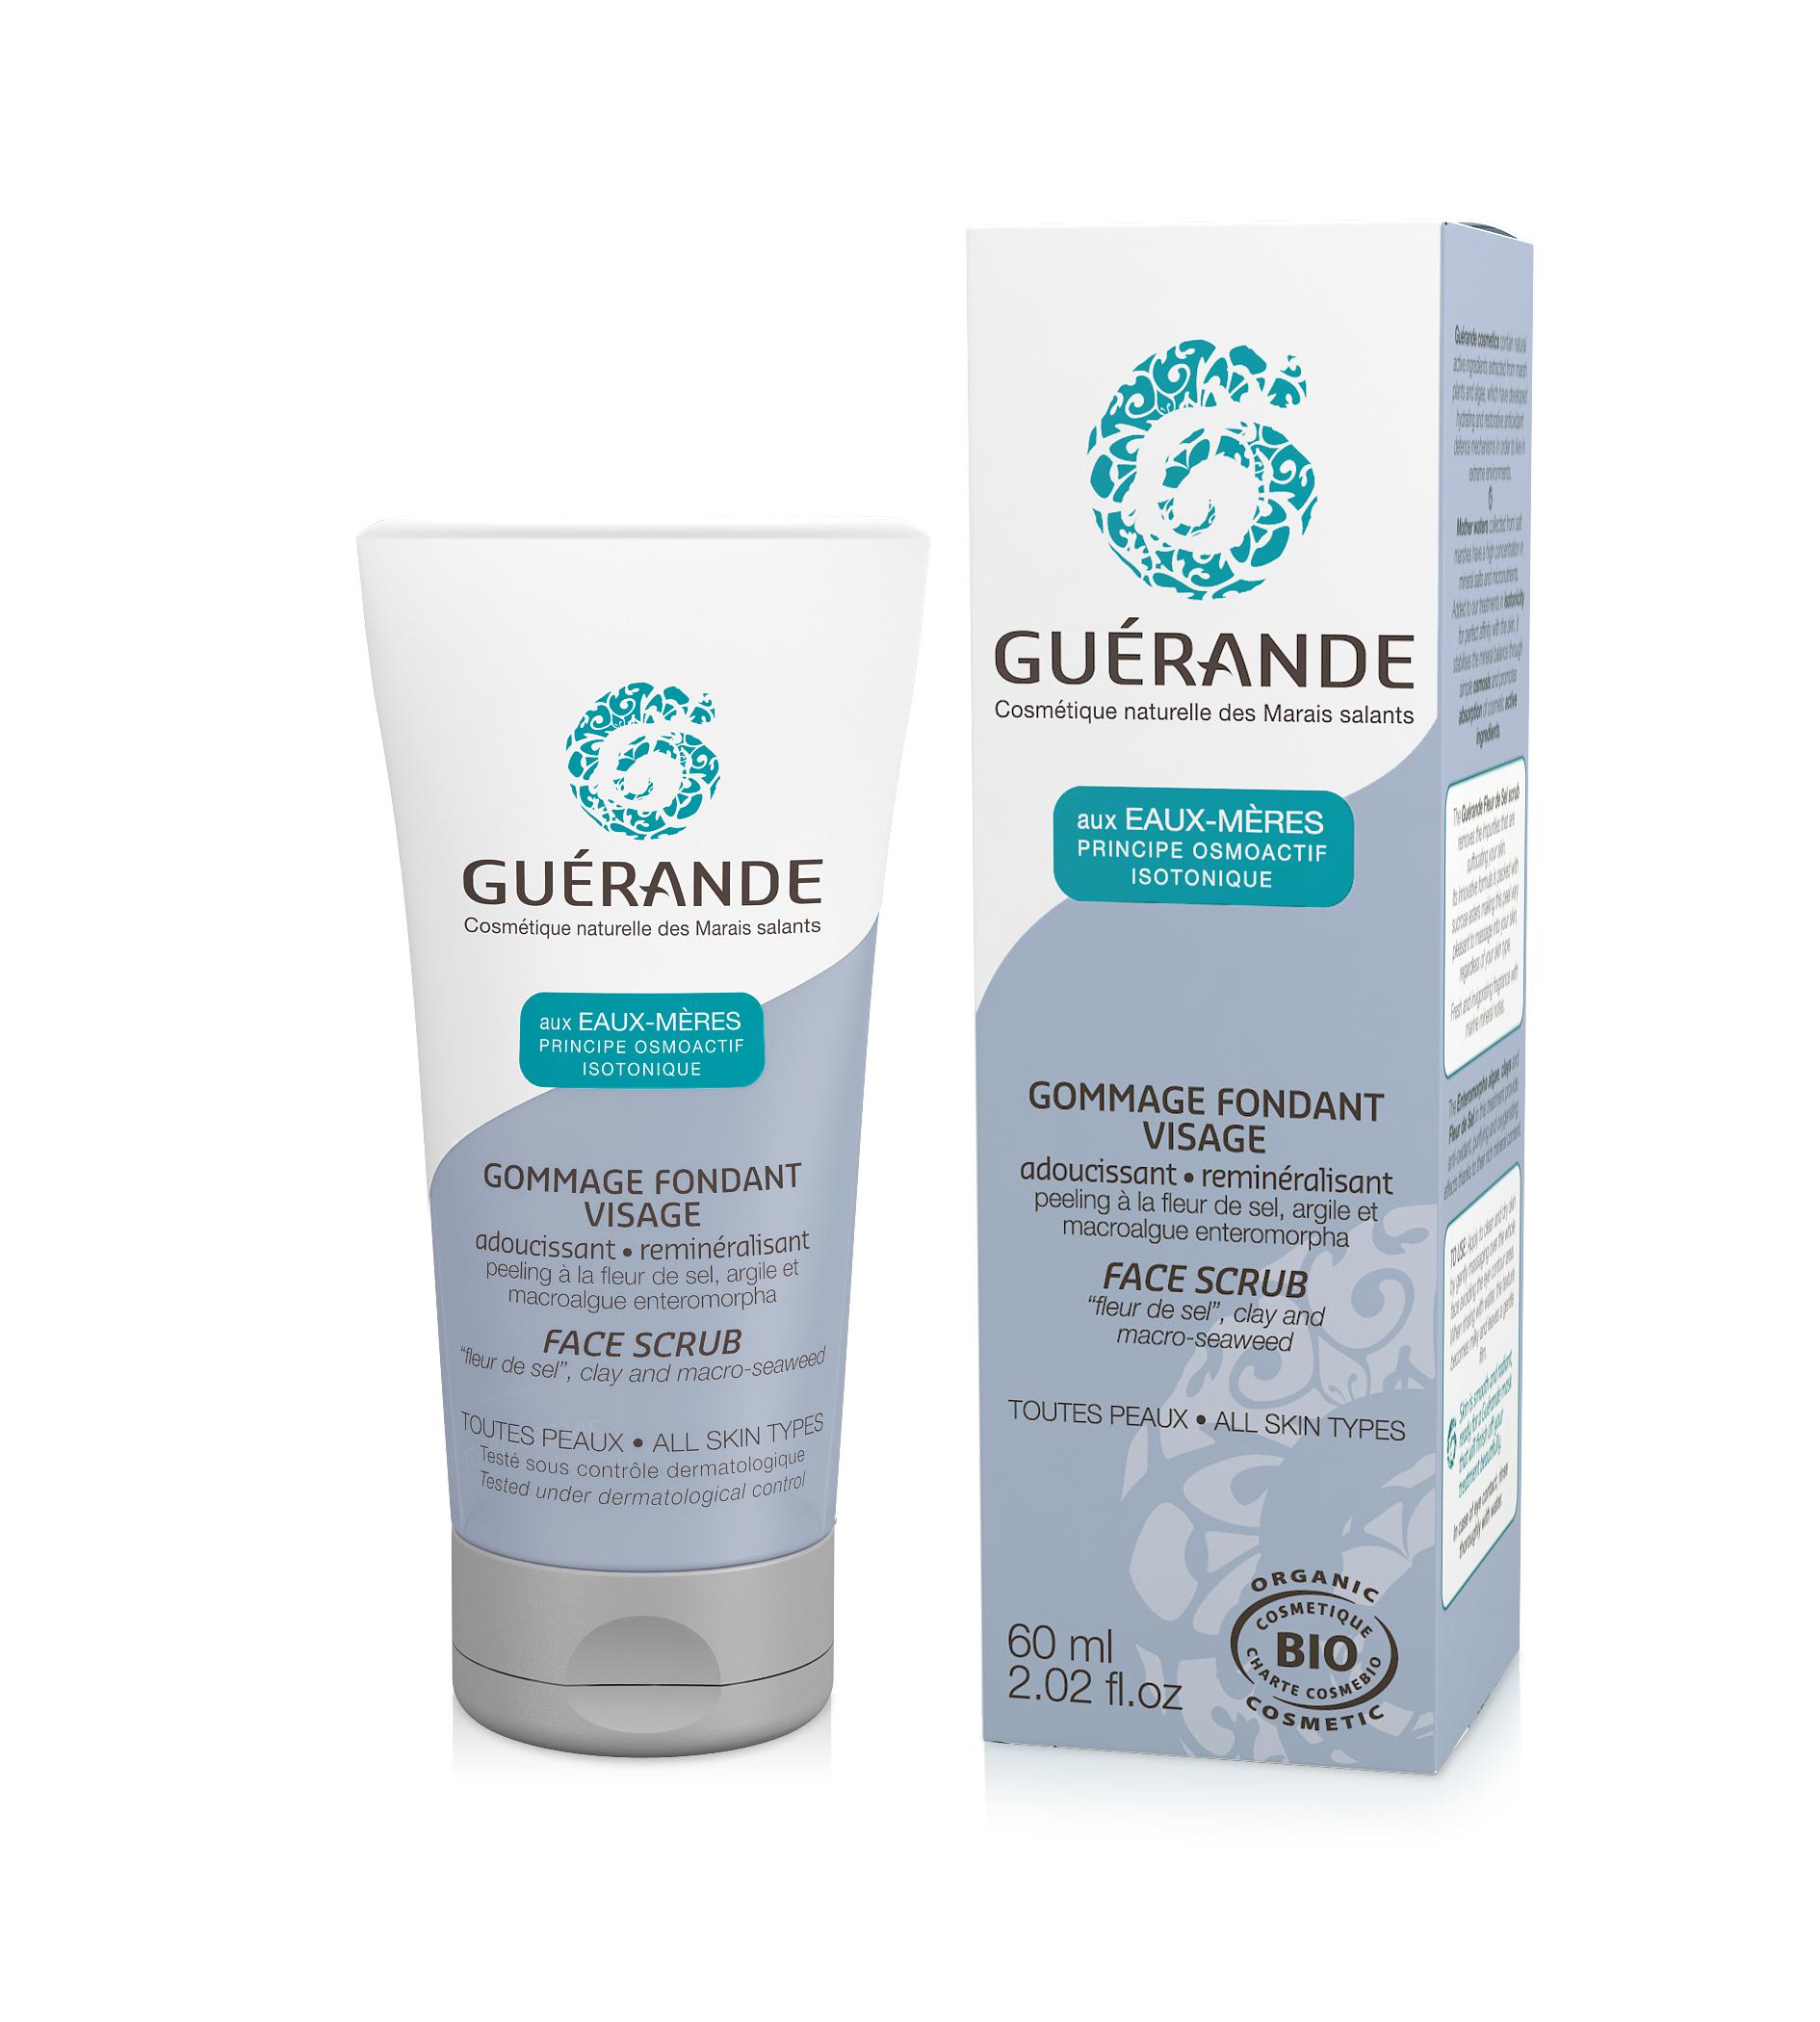 Guérande-Gommage fondant visage